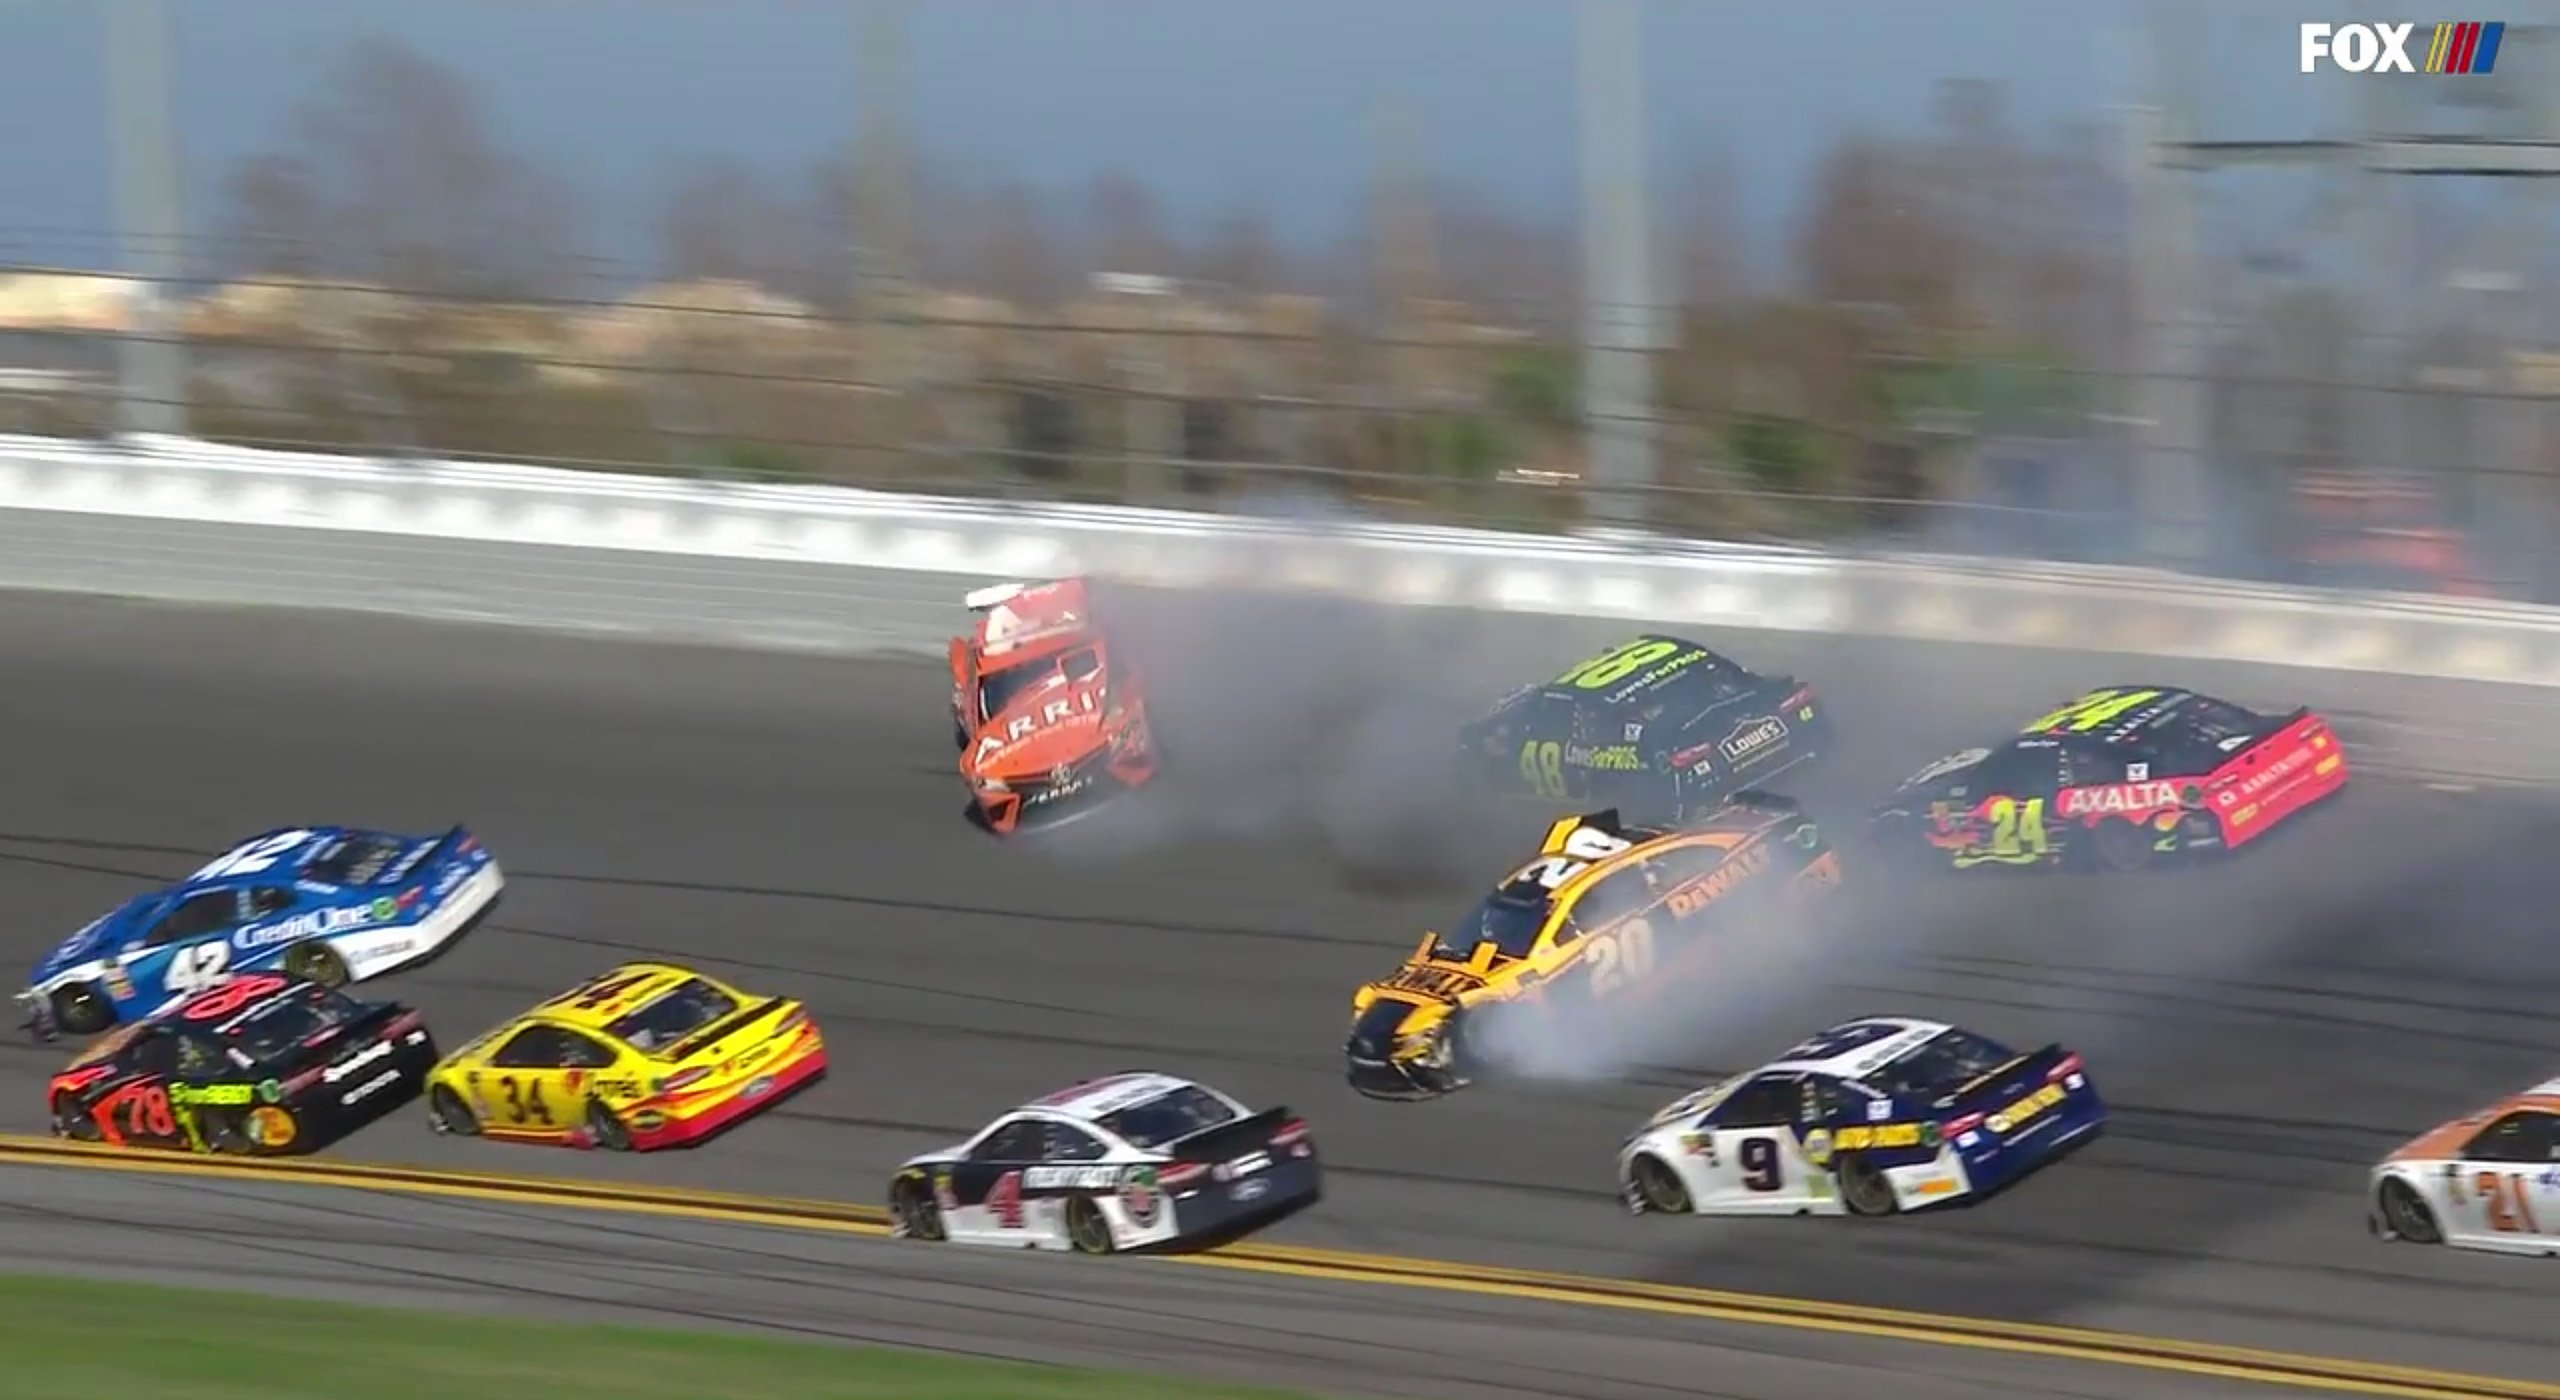 Big One in 2018 Daytona 500 - Stage 1 crash